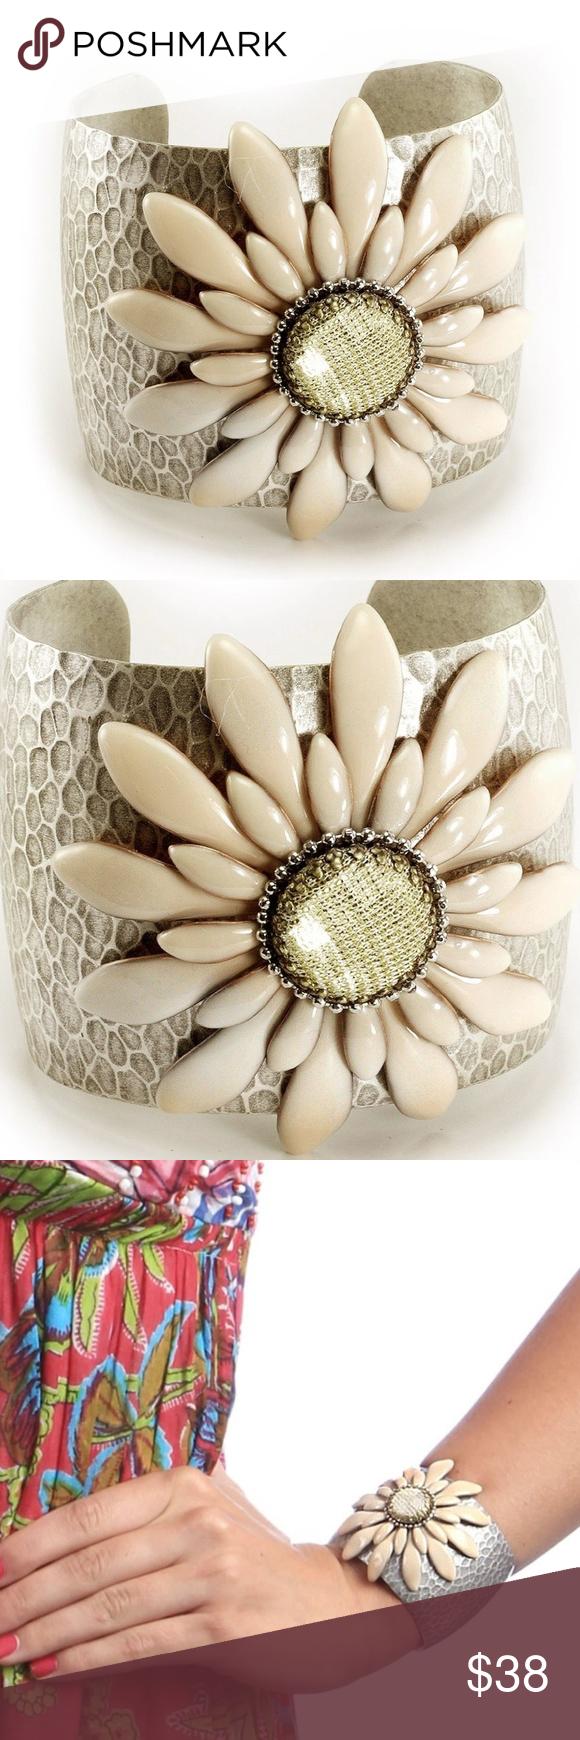 Nwot Cream Double Daisy Flower Cuff Bracelet Cushion Cut